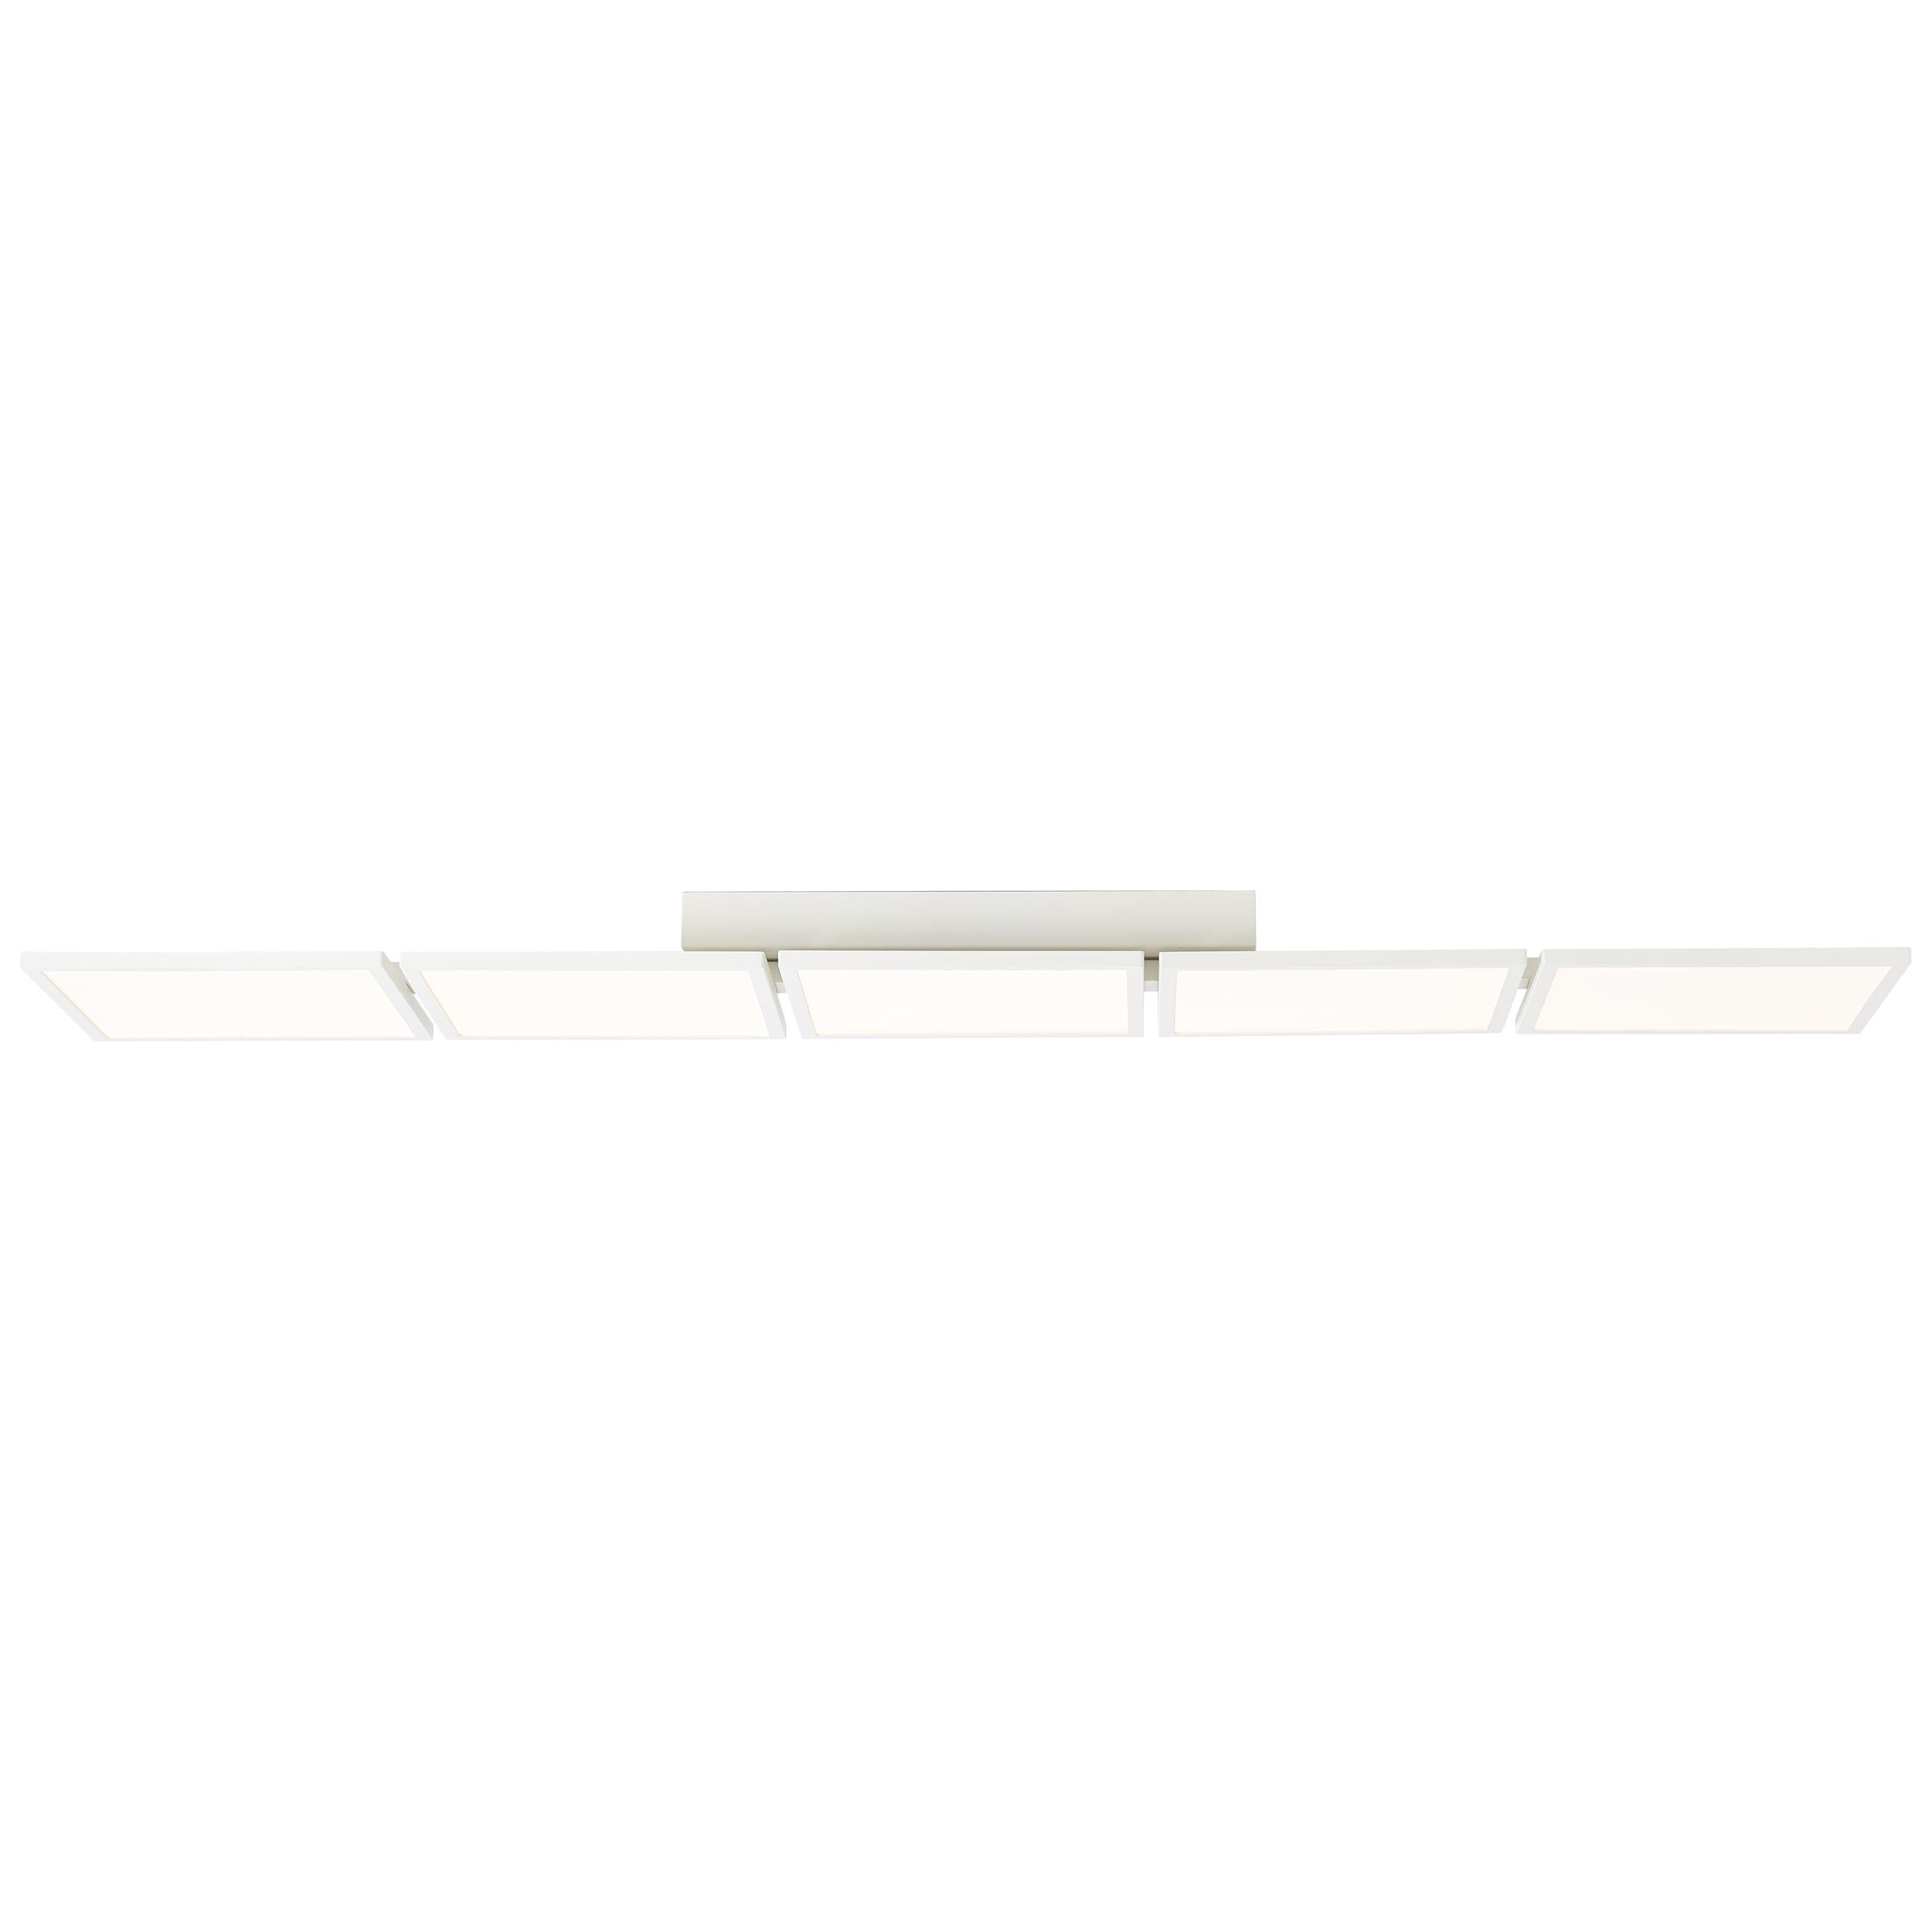 AEG Garek LED Deckenaufbau-Paneel 129x25cm sand/weiß